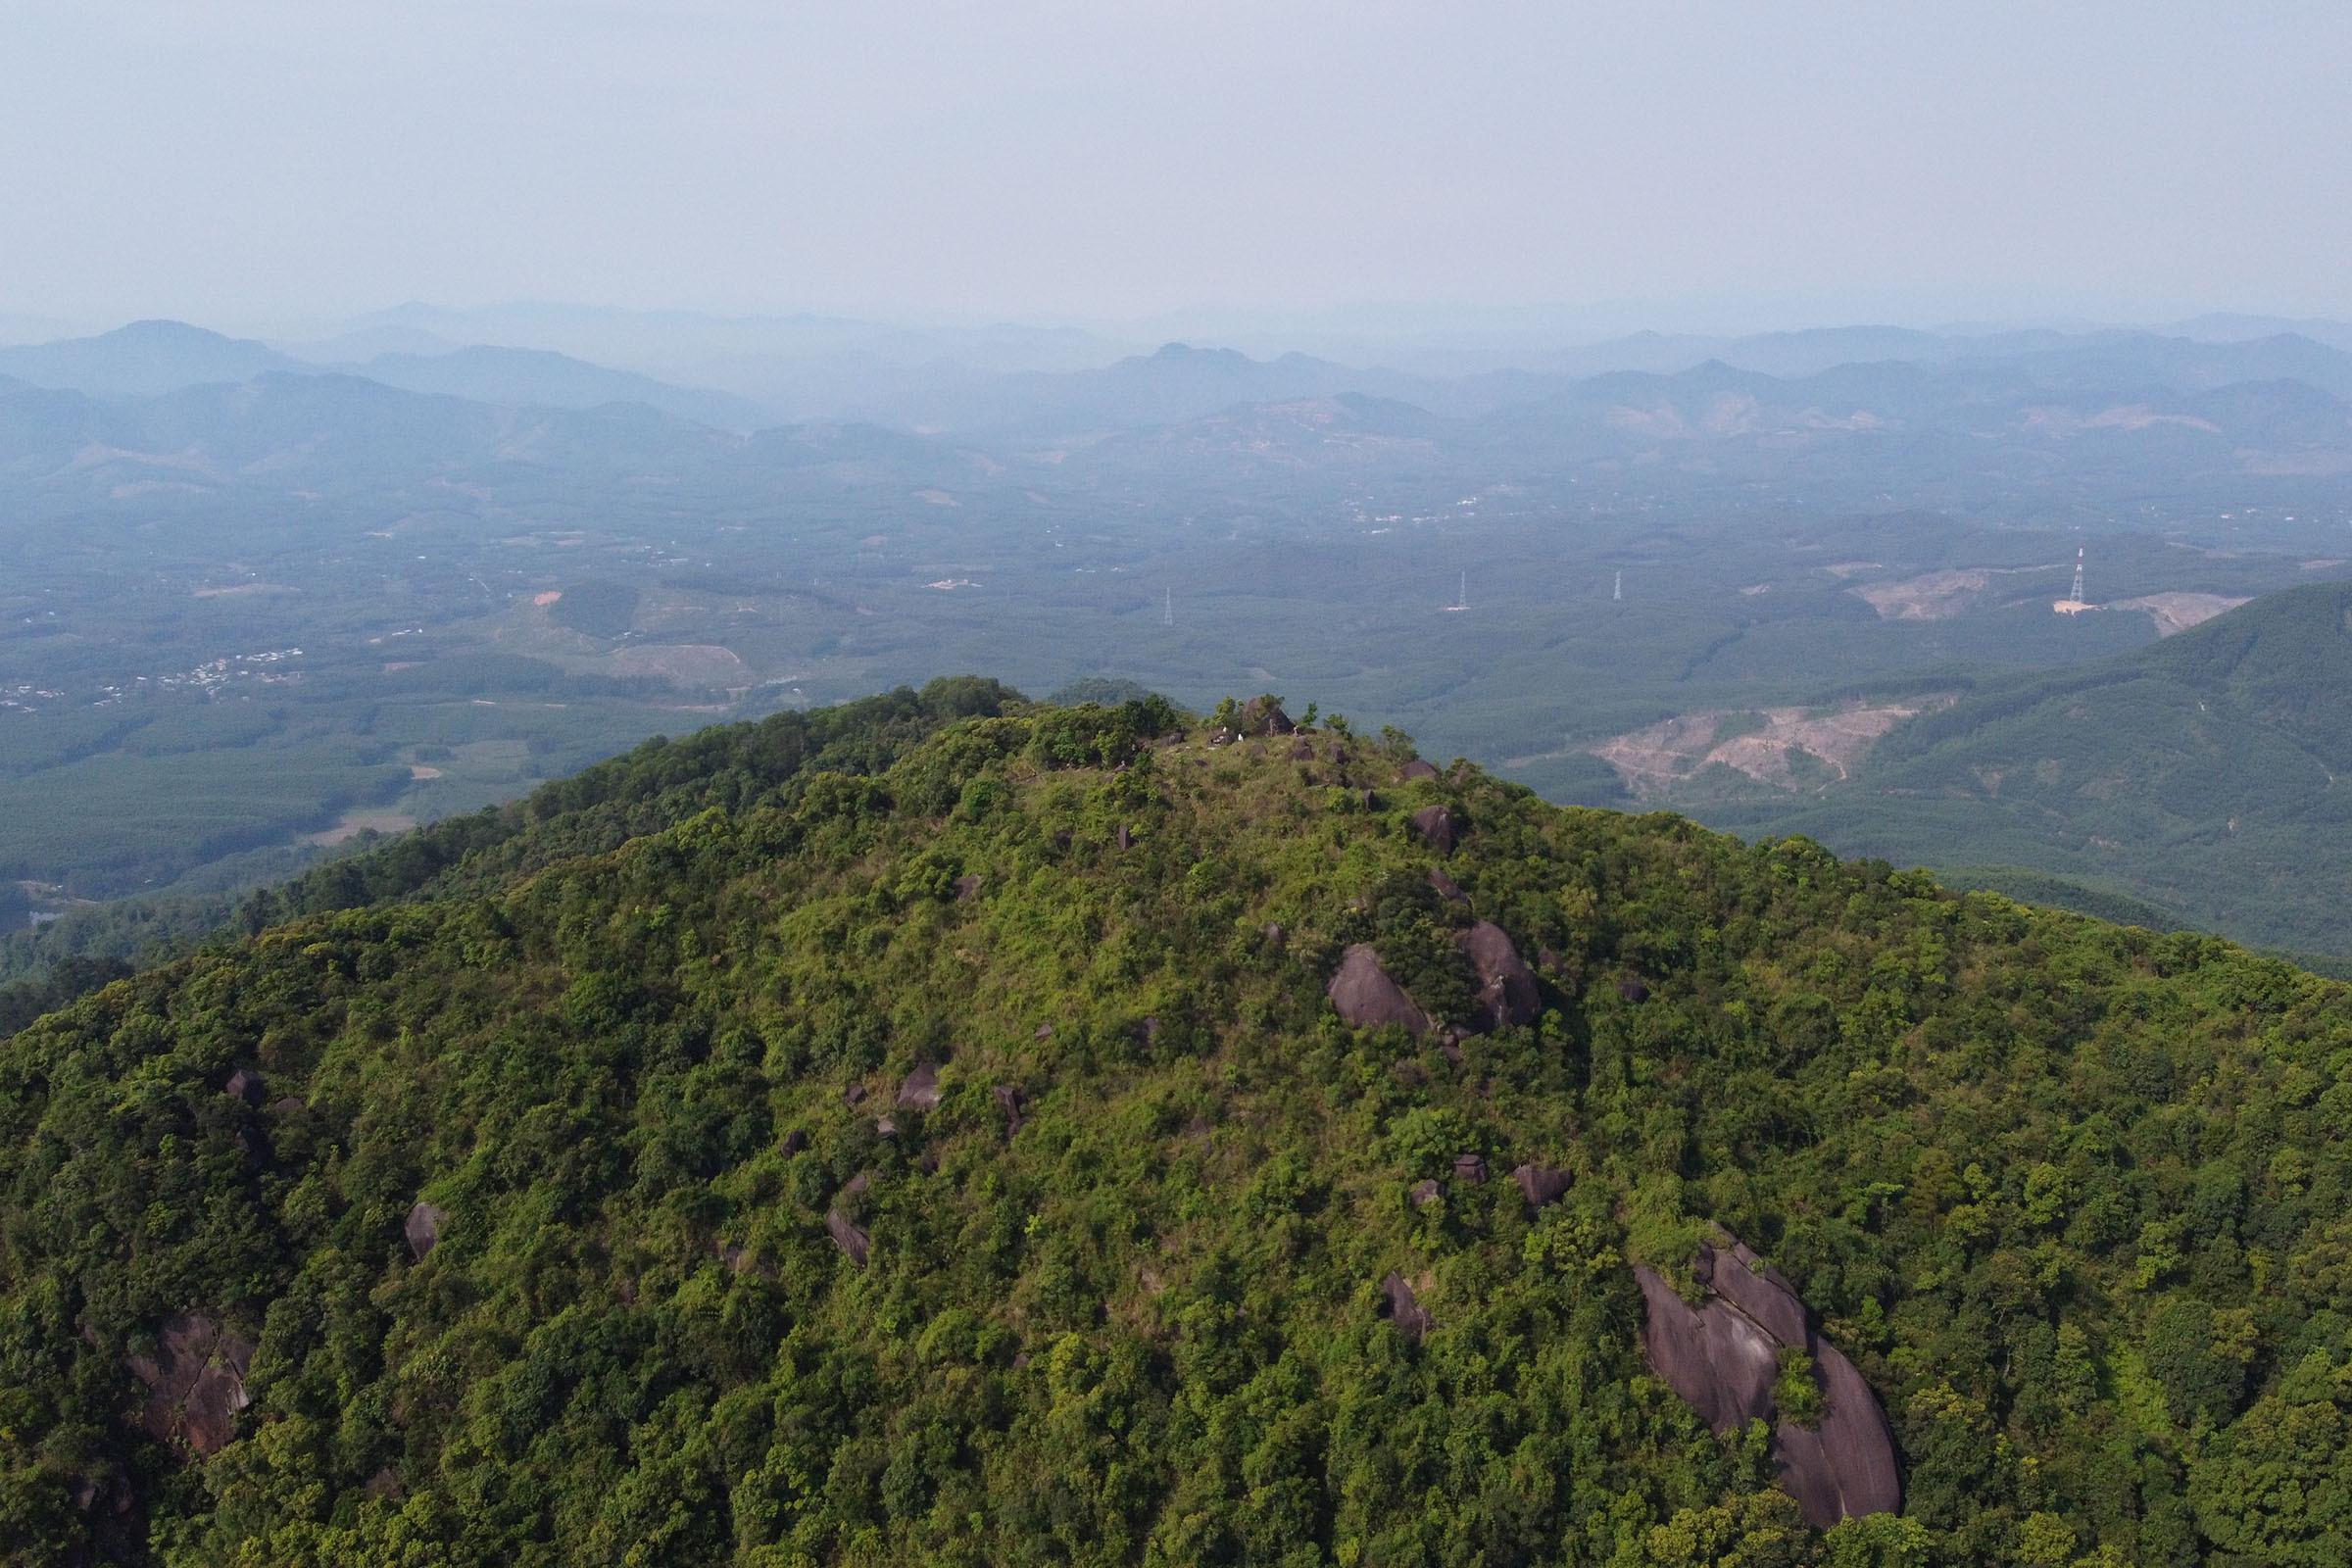 7 tuổi chinh phục núi cao nhất Huế